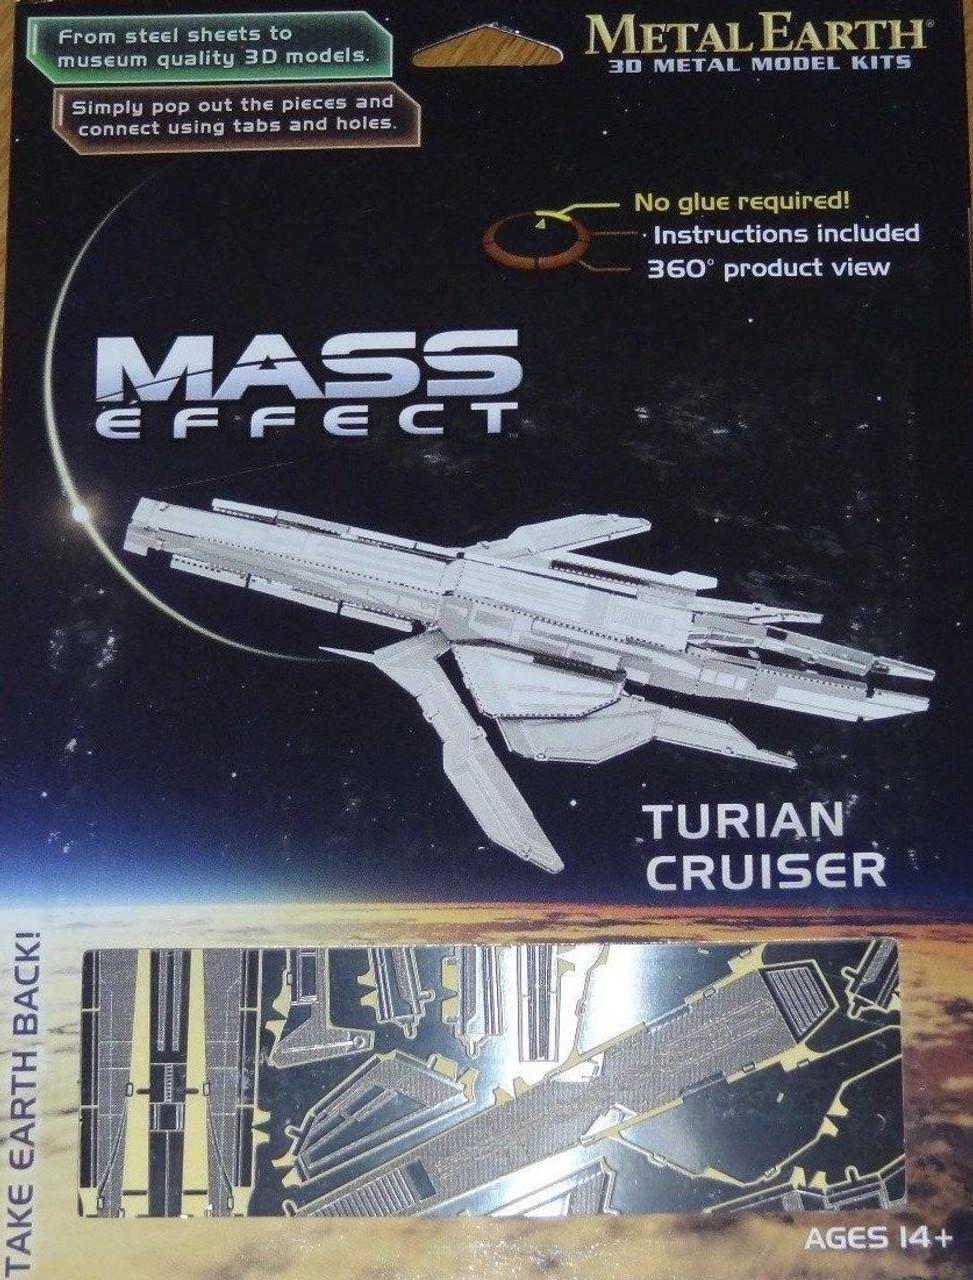 Turian Cruiser Mass Effect Metal Earth Corner Pockets